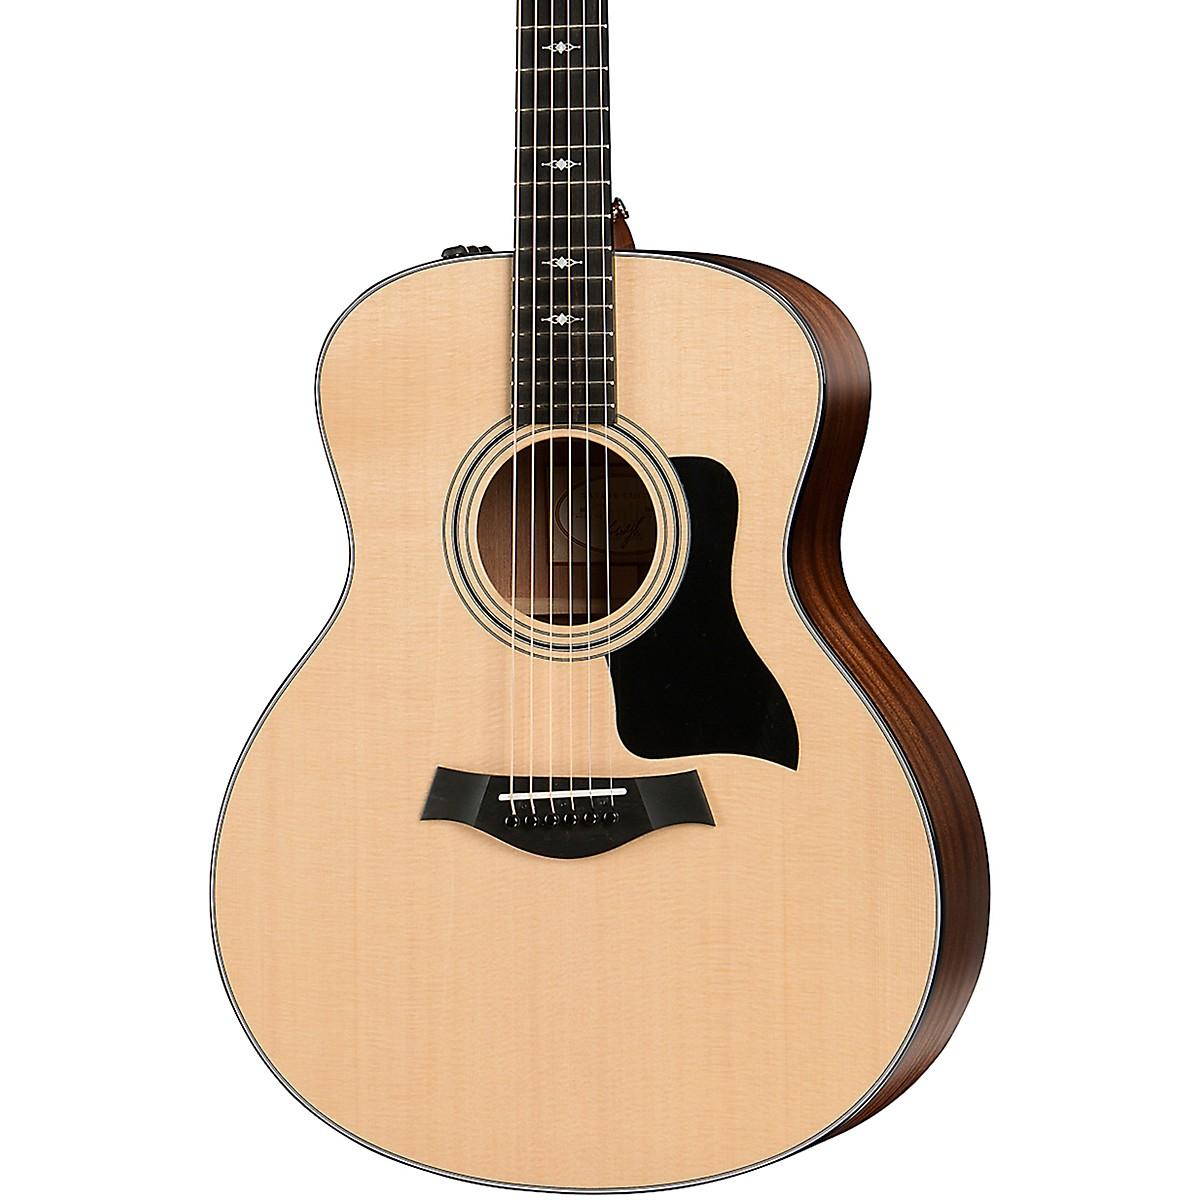 Taylor 316e Grand Symphony Acoustic-Electric Guitar